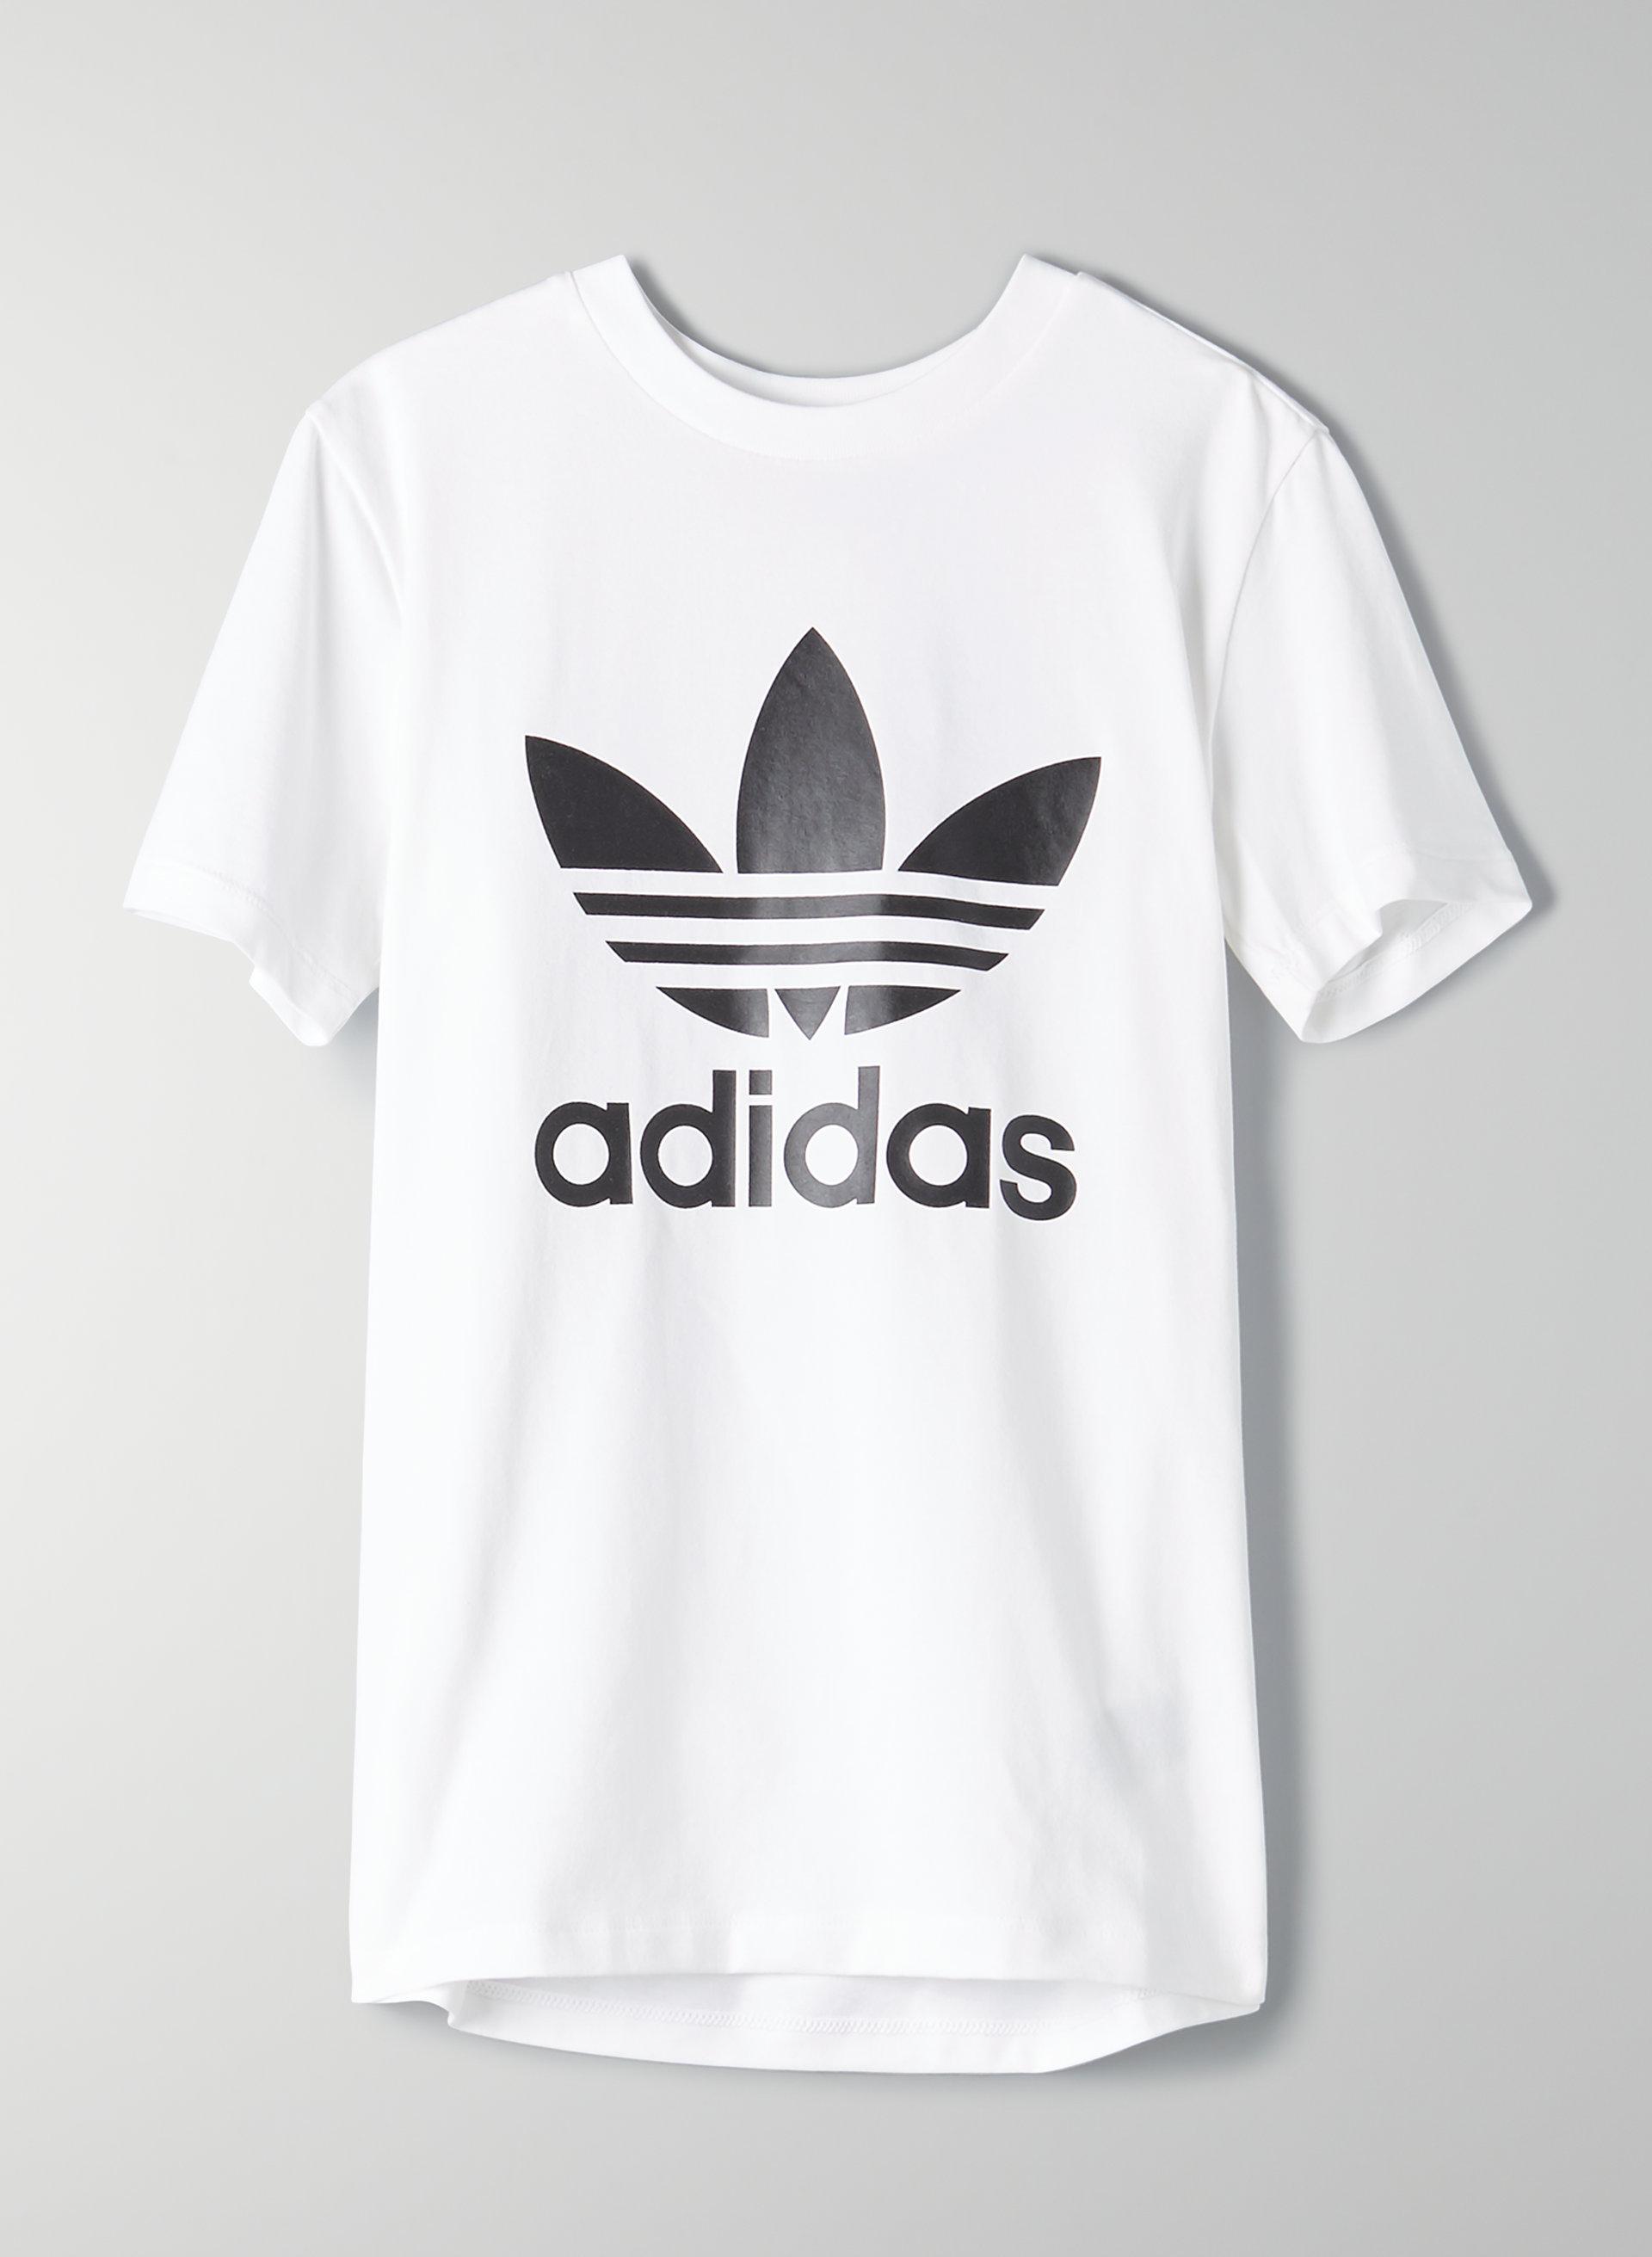 c35bdb623 TREFOIL TEE - Iconic crewneck t-shirt